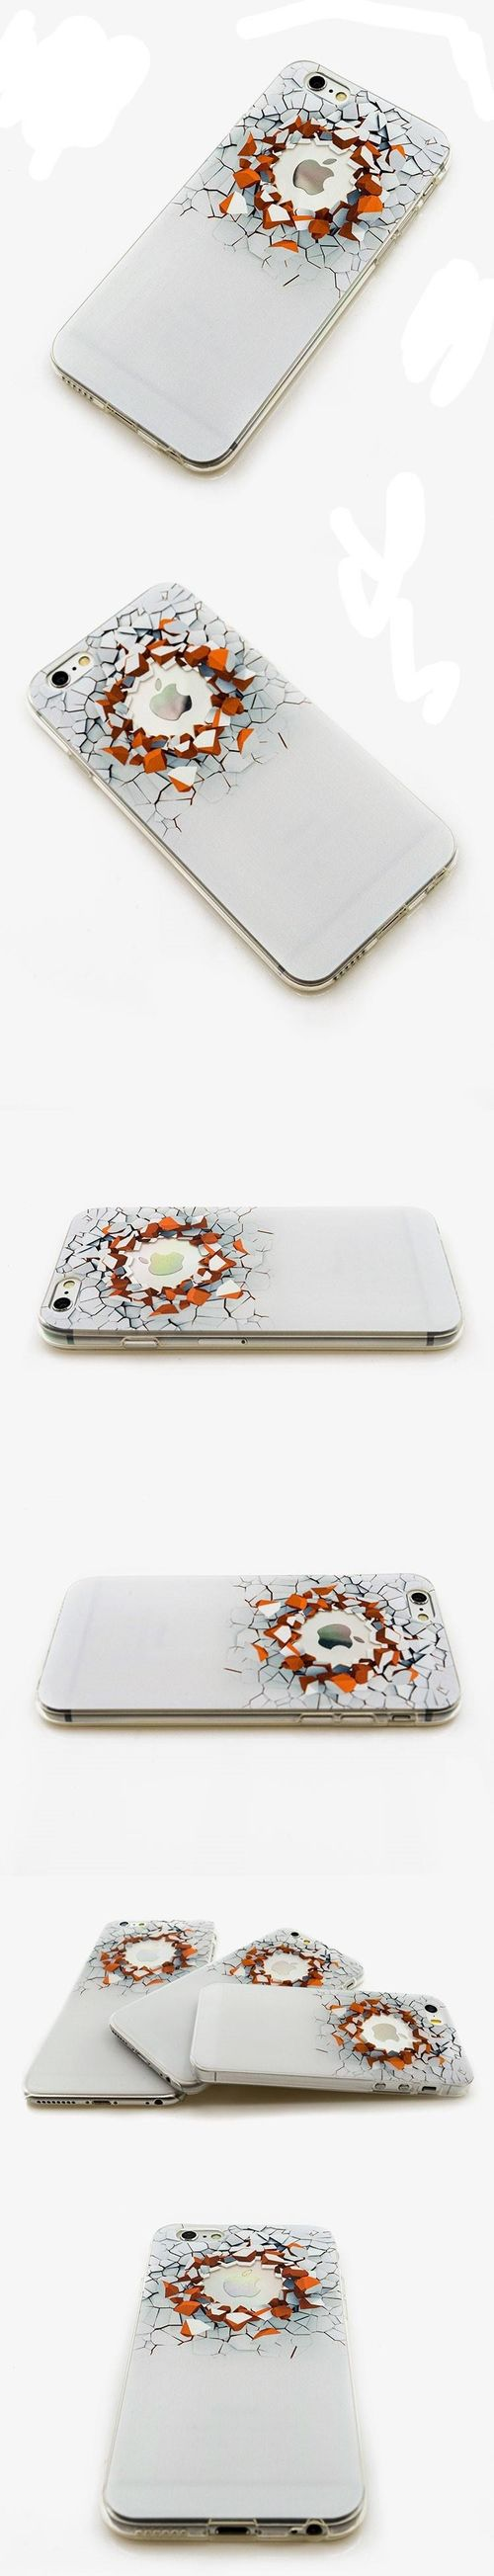 Silikonový kryt pro iPhone 6/6s Creative 3d